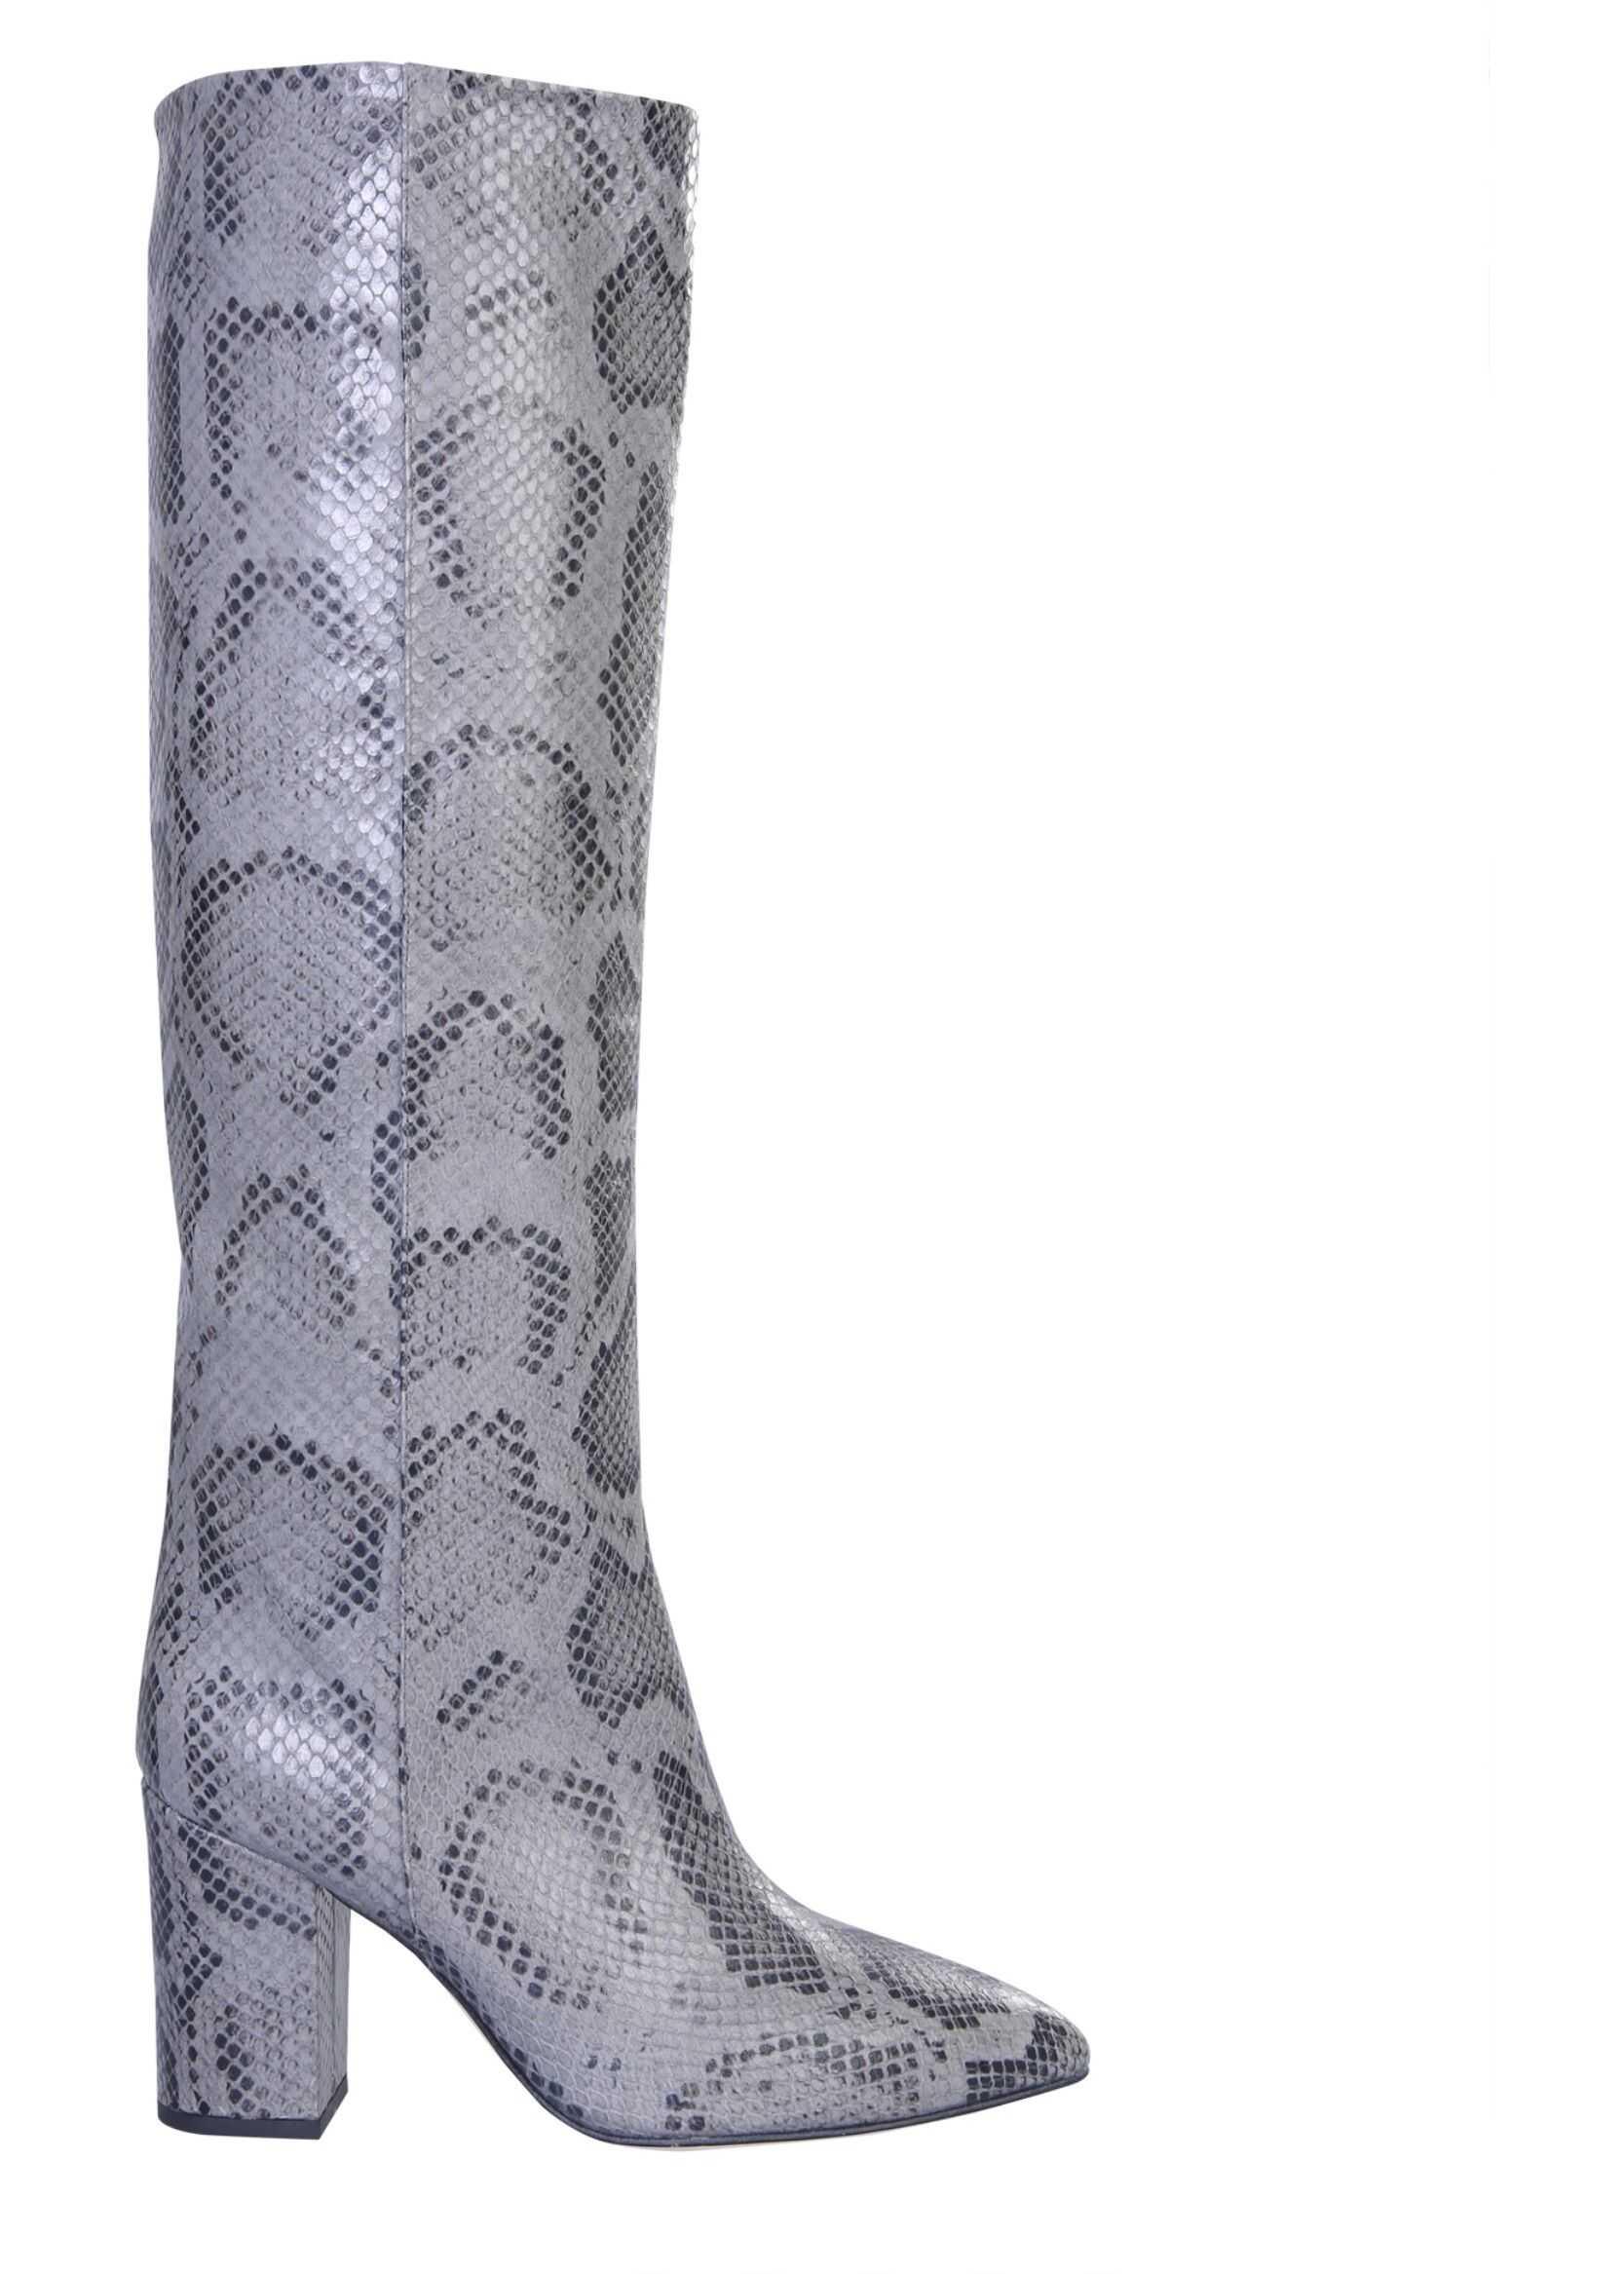 Paris Texas High Boots PX166_XPMBBGRIGIO GREY imagine b-mall.ro